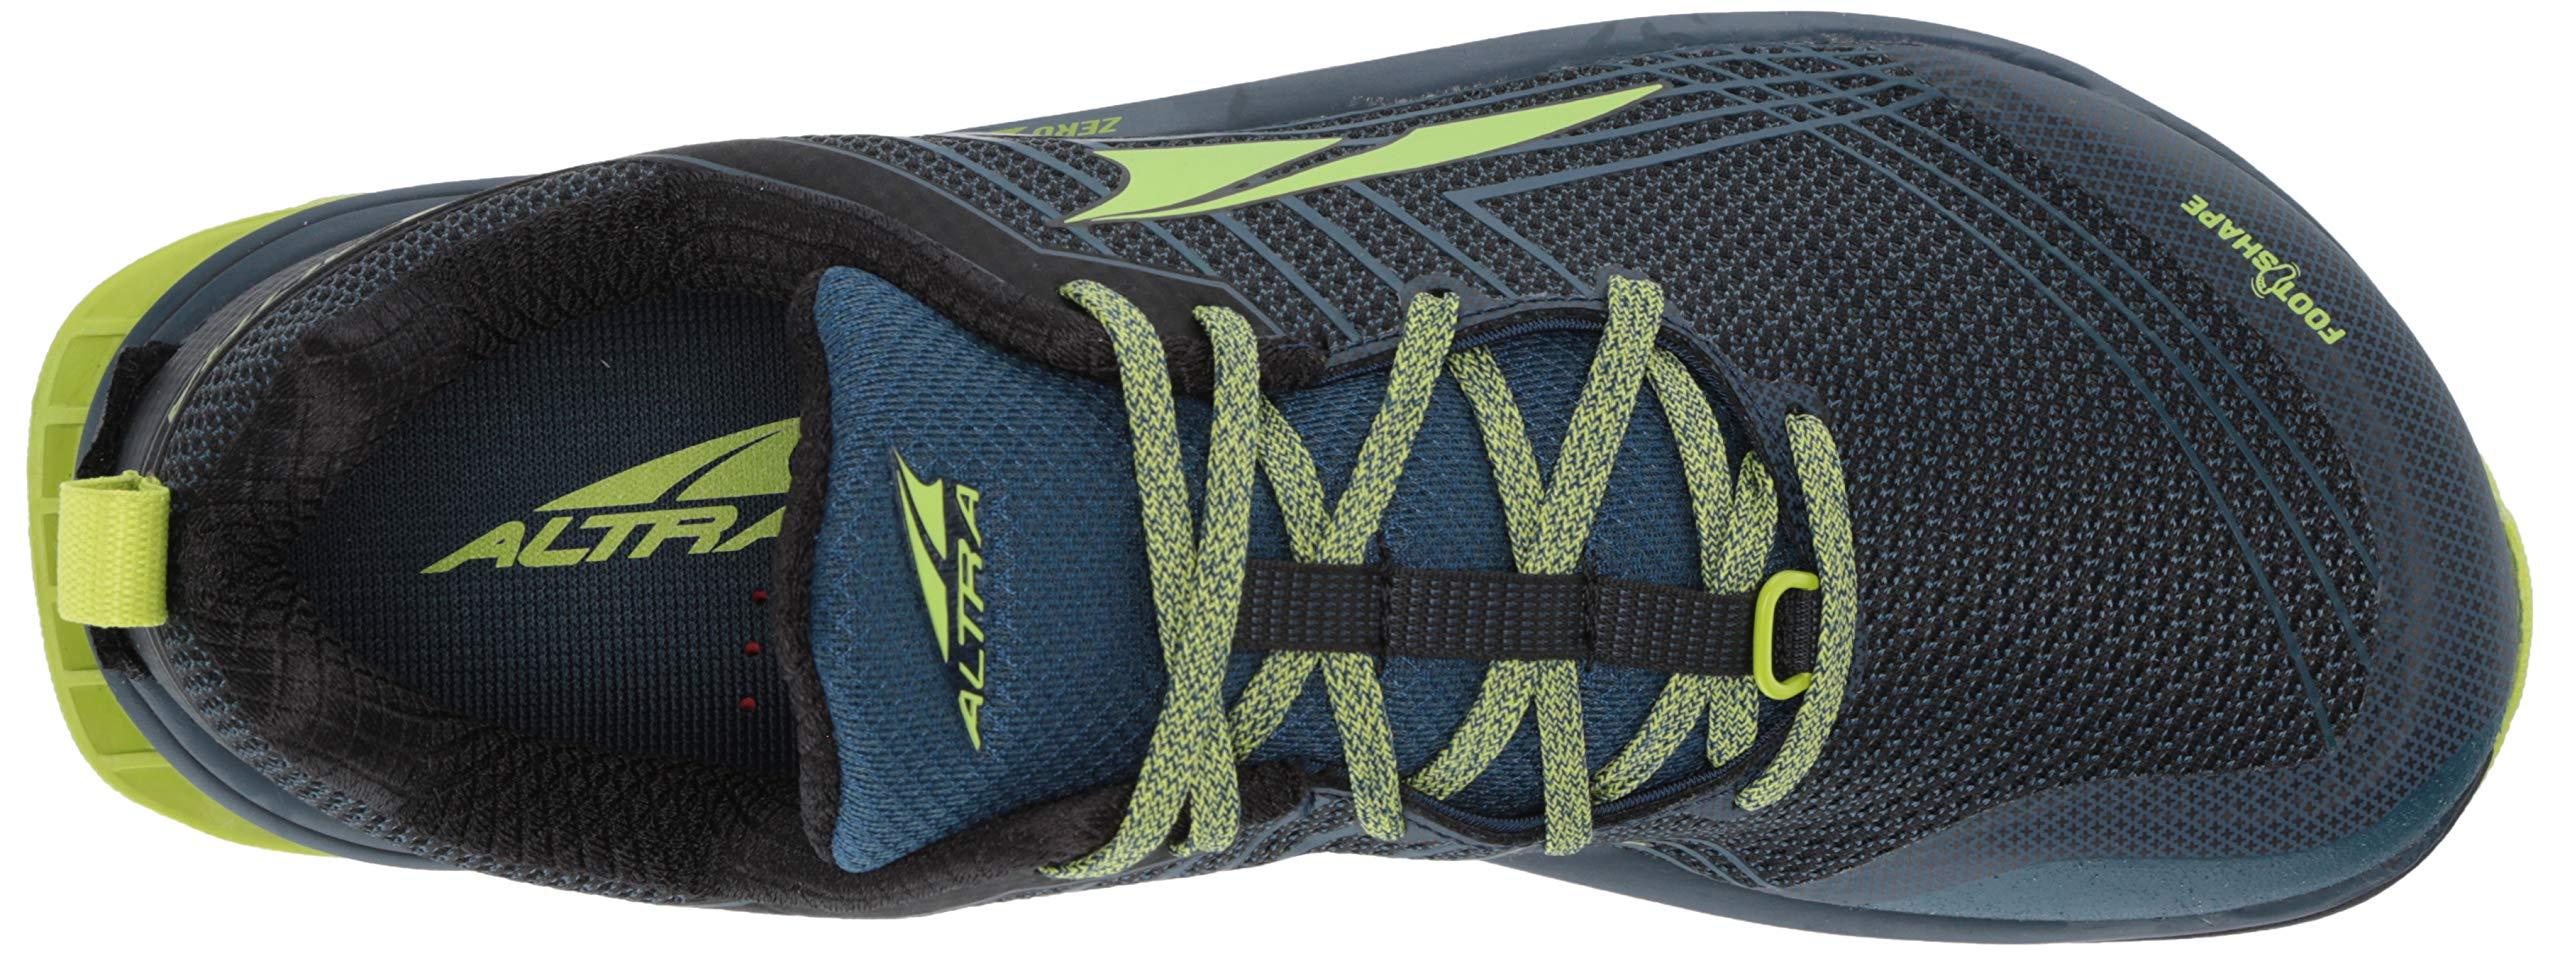 Altra Footwear Men's TIMP 1.5 Blue/Lime 7 D US by Altra (Image #8)